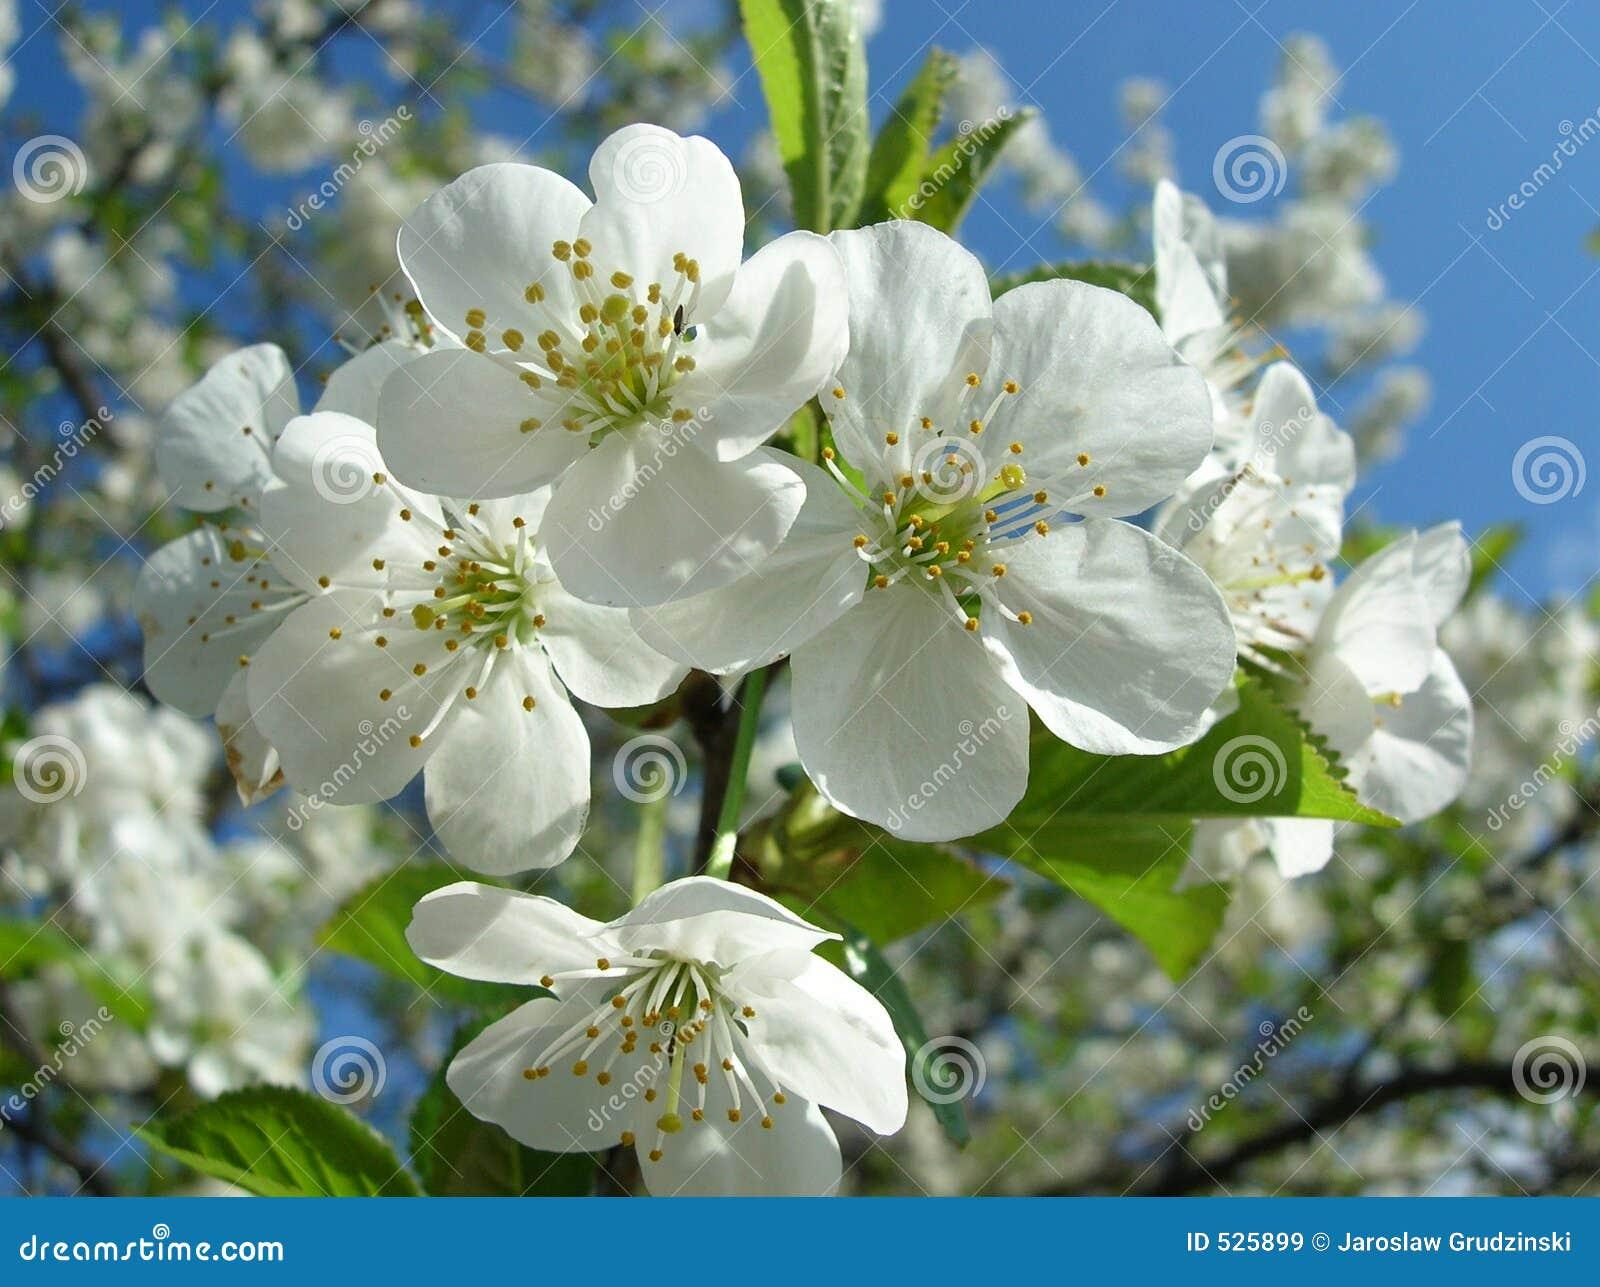 Download 樱桃花 库存图片. 图片 包括有 空白, 背包, 开花, 植物群, 结构树, beauvoir, 室外, 从事园艺 - 525899